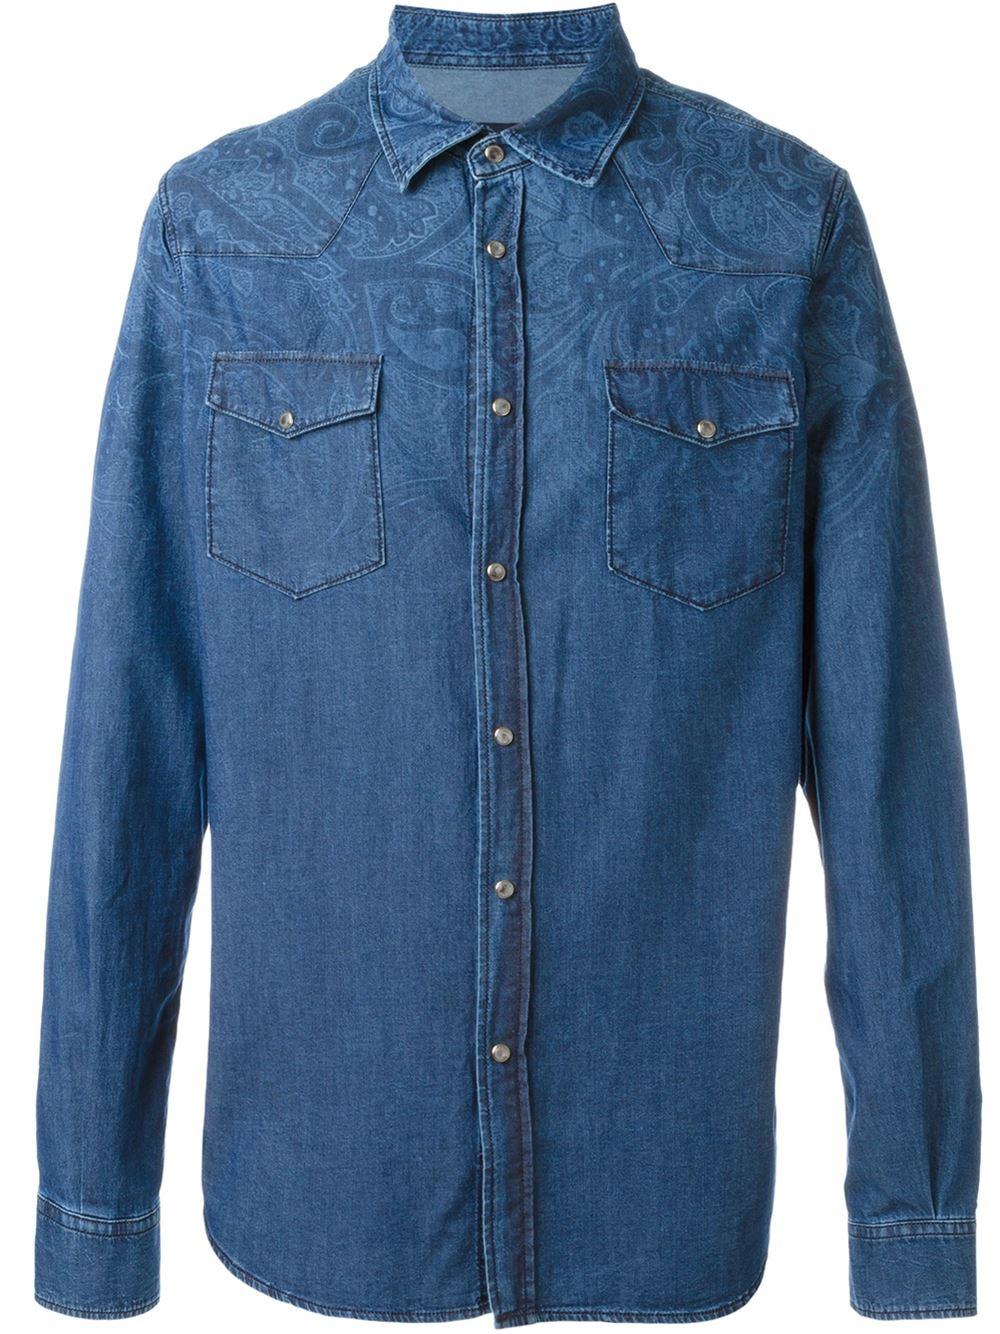 Lyst etro denim shirt in blue for men for Etro men s shirts